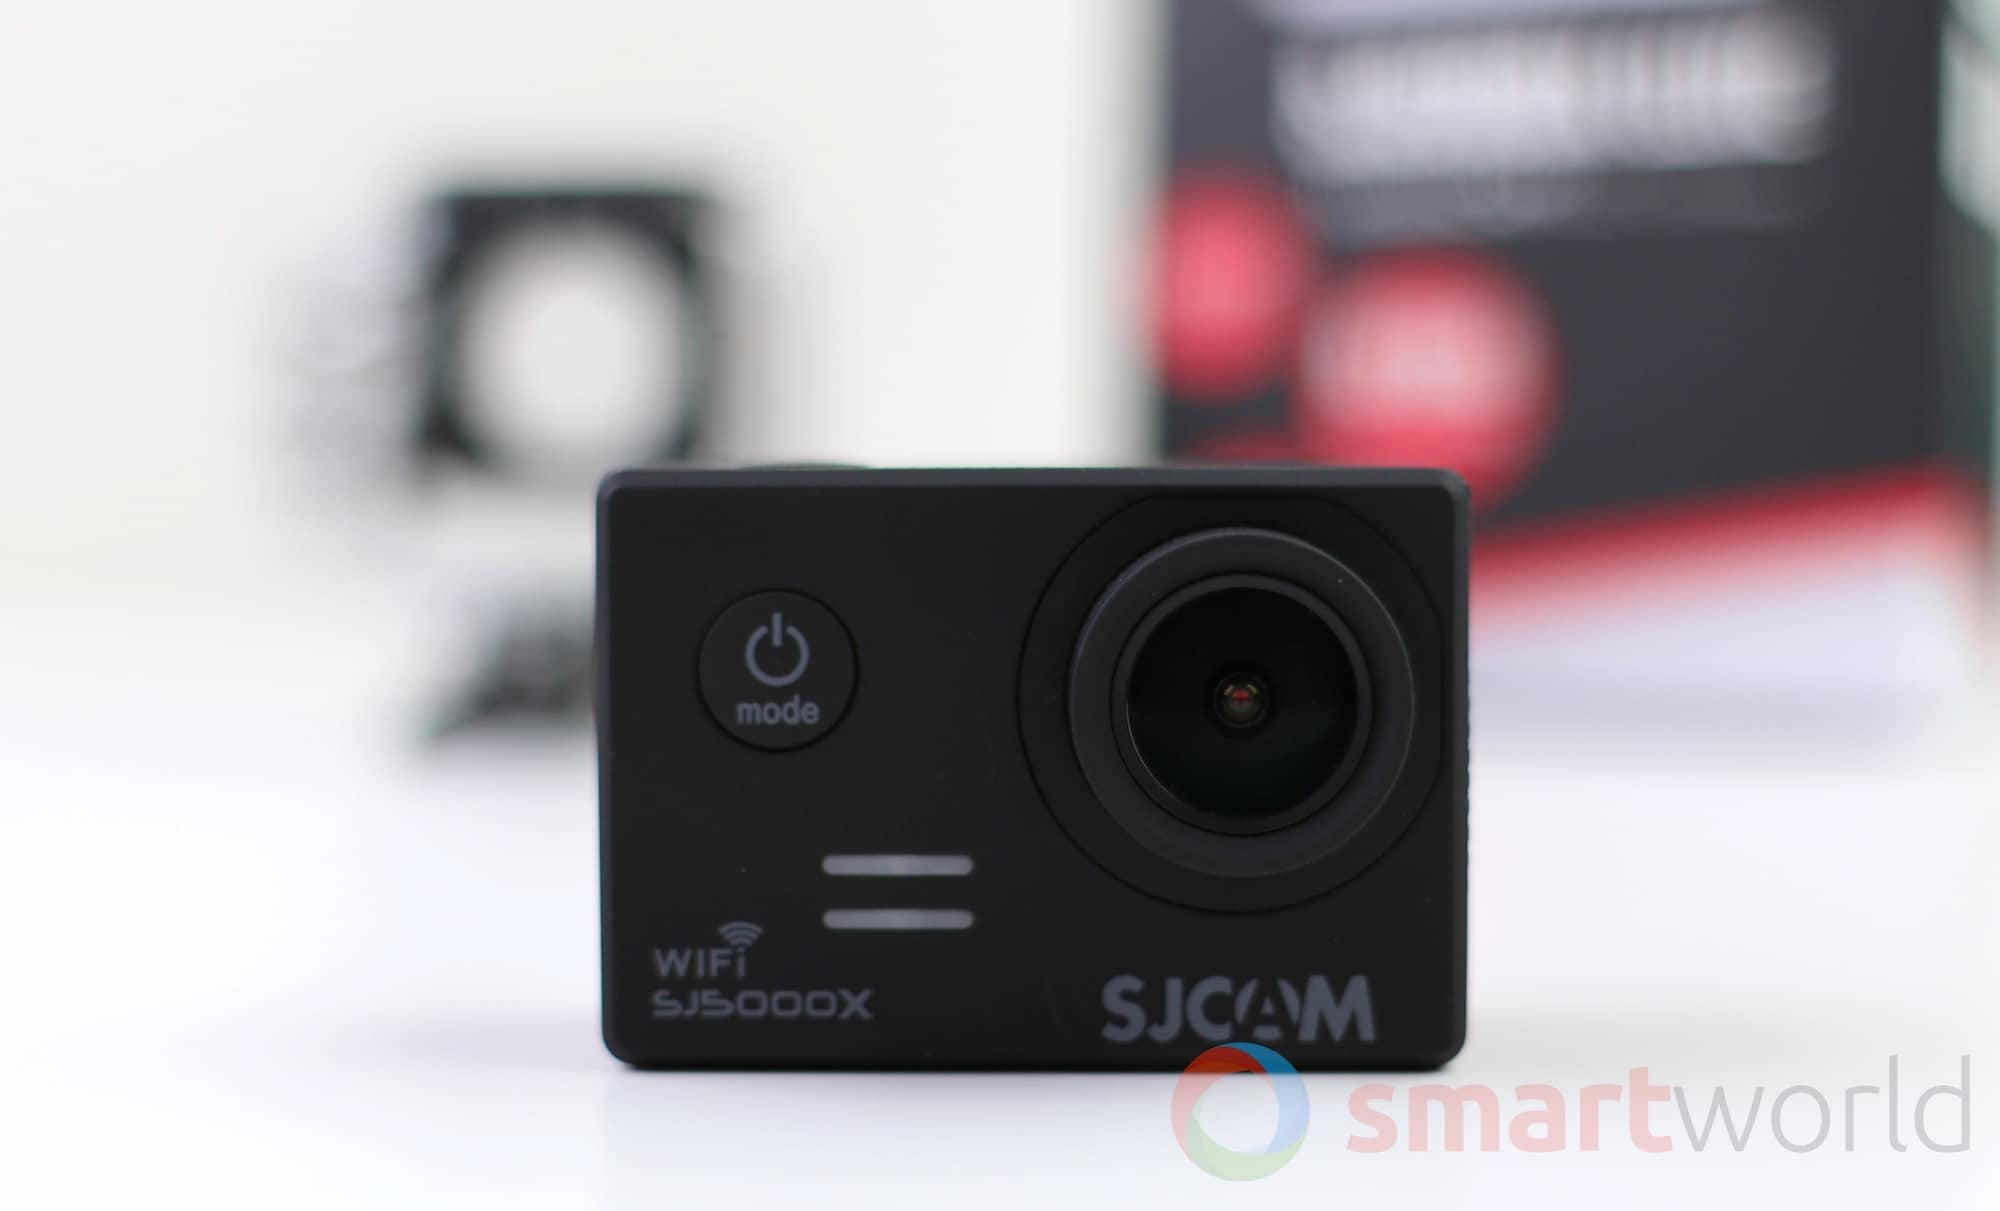 SJCAM SJ5000x – 2